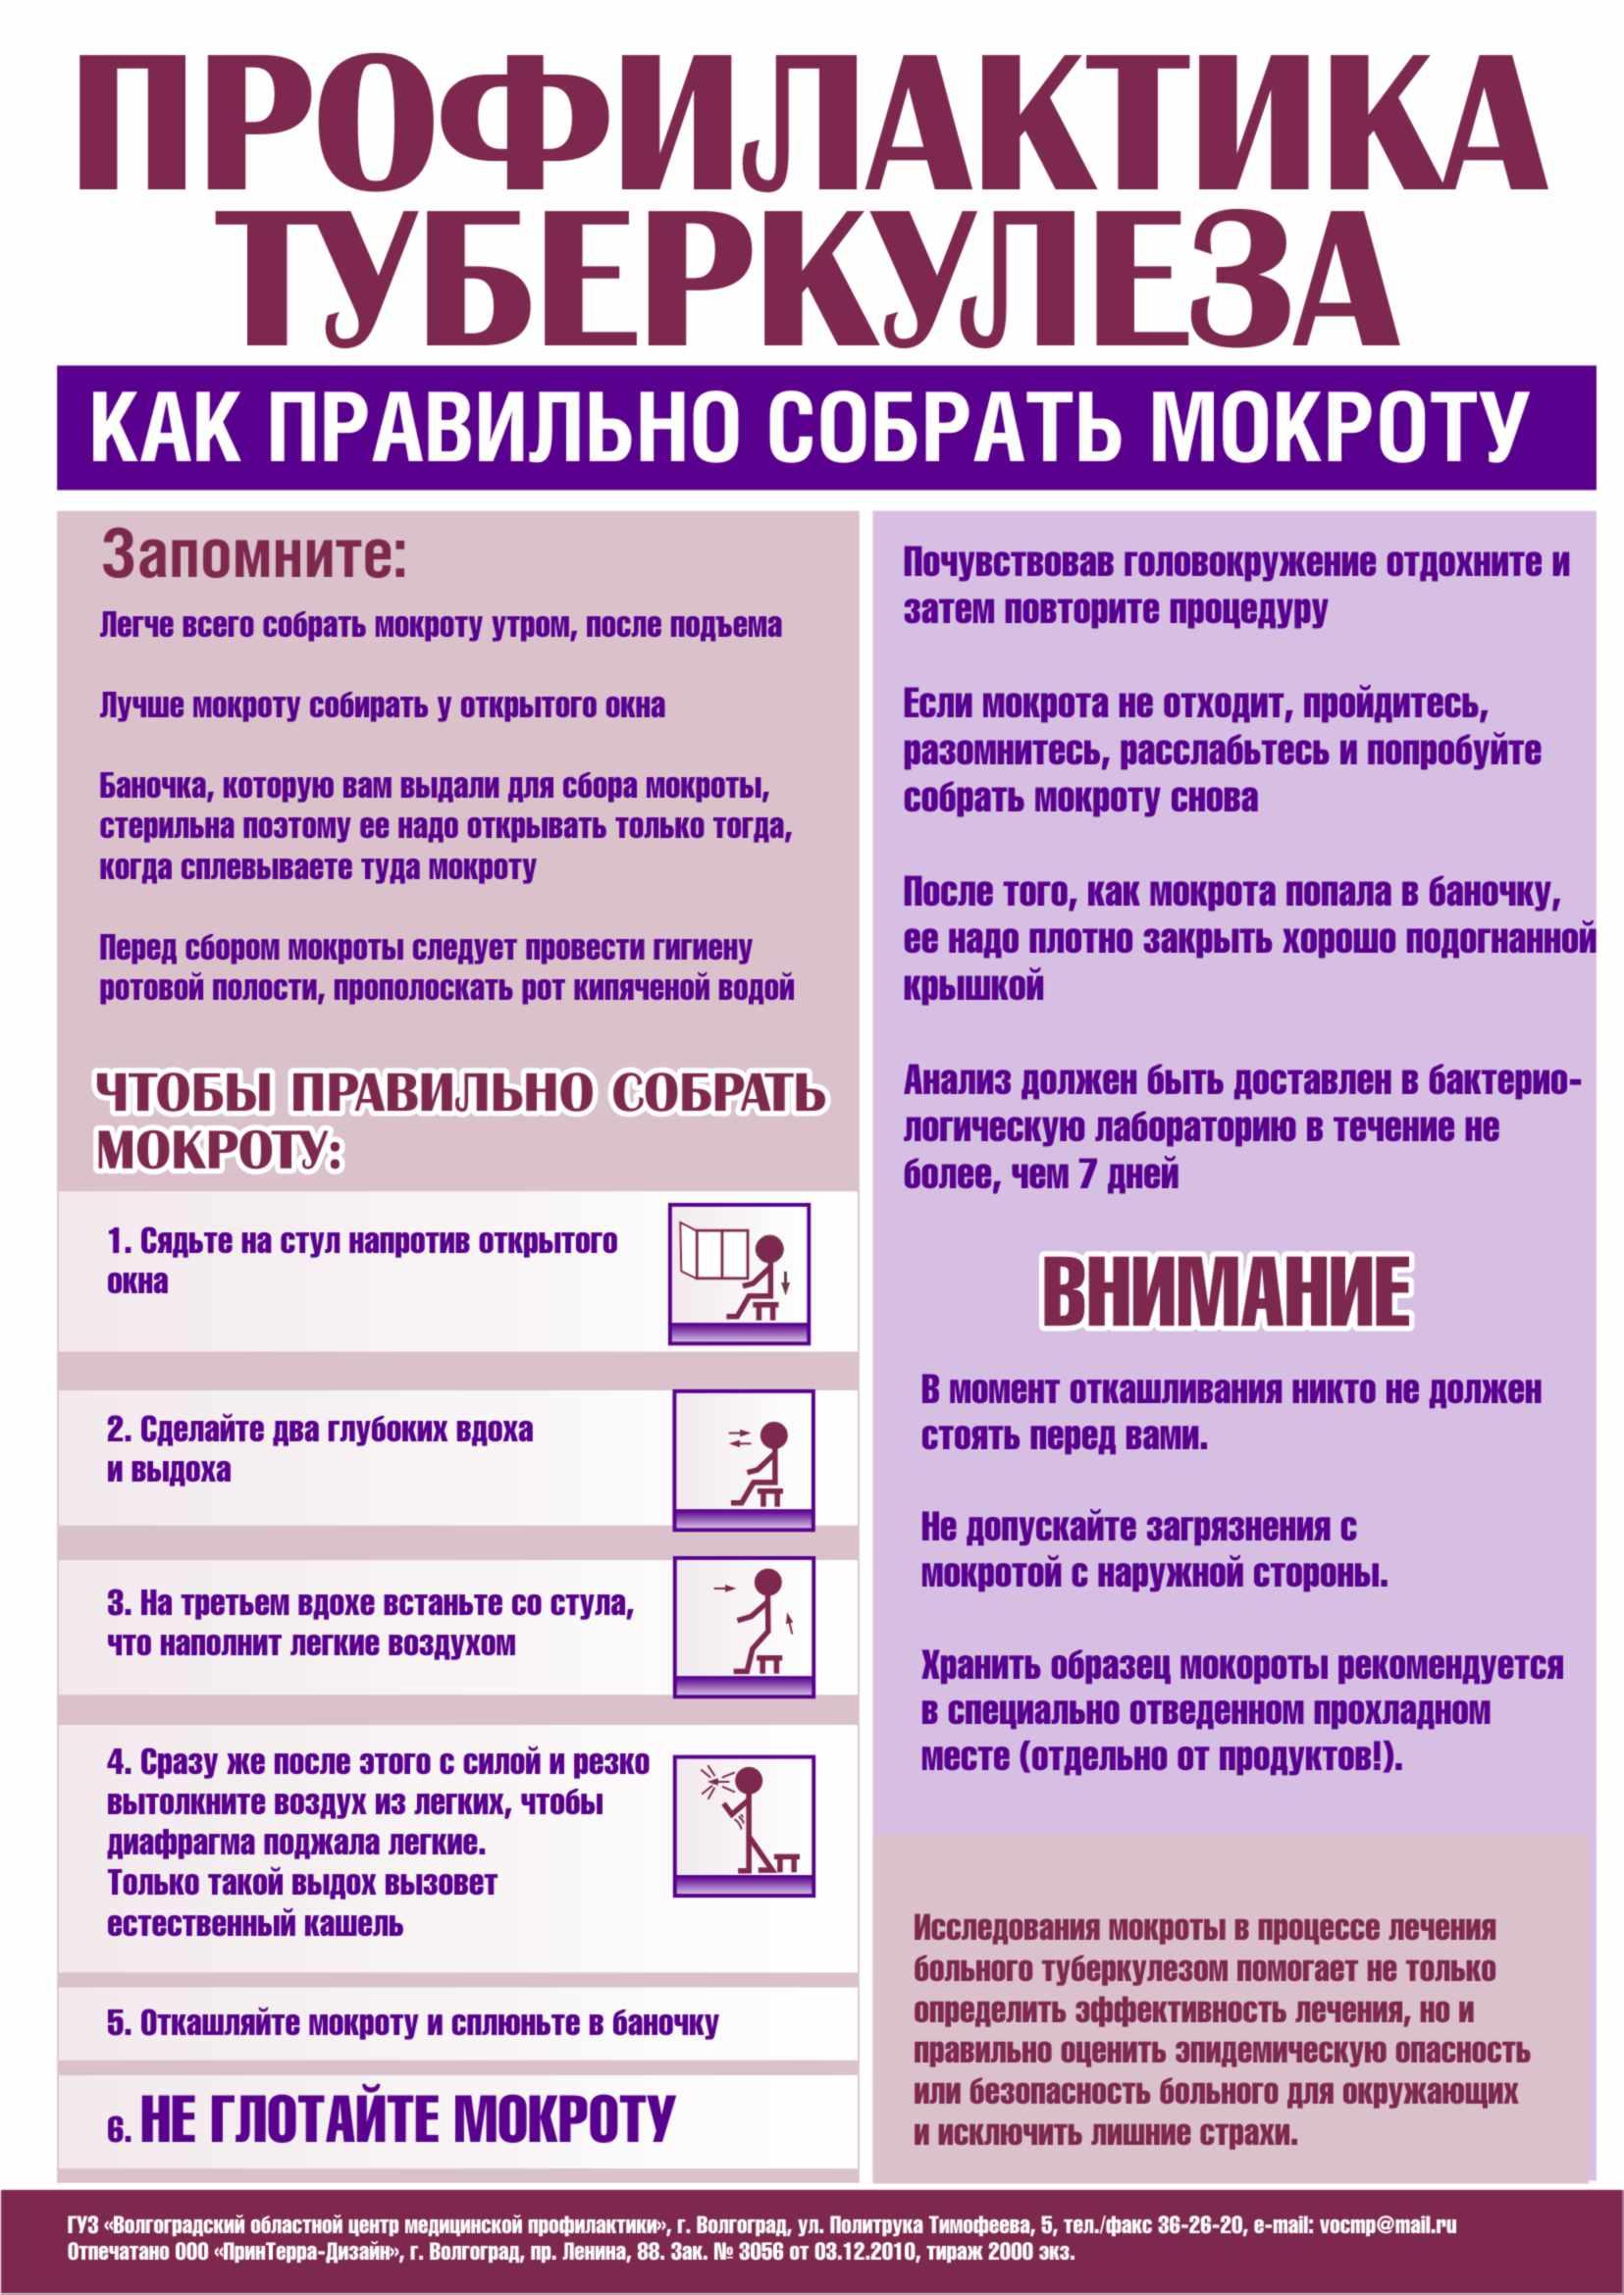 plakat_profilaktika_tuberkuljoza_2